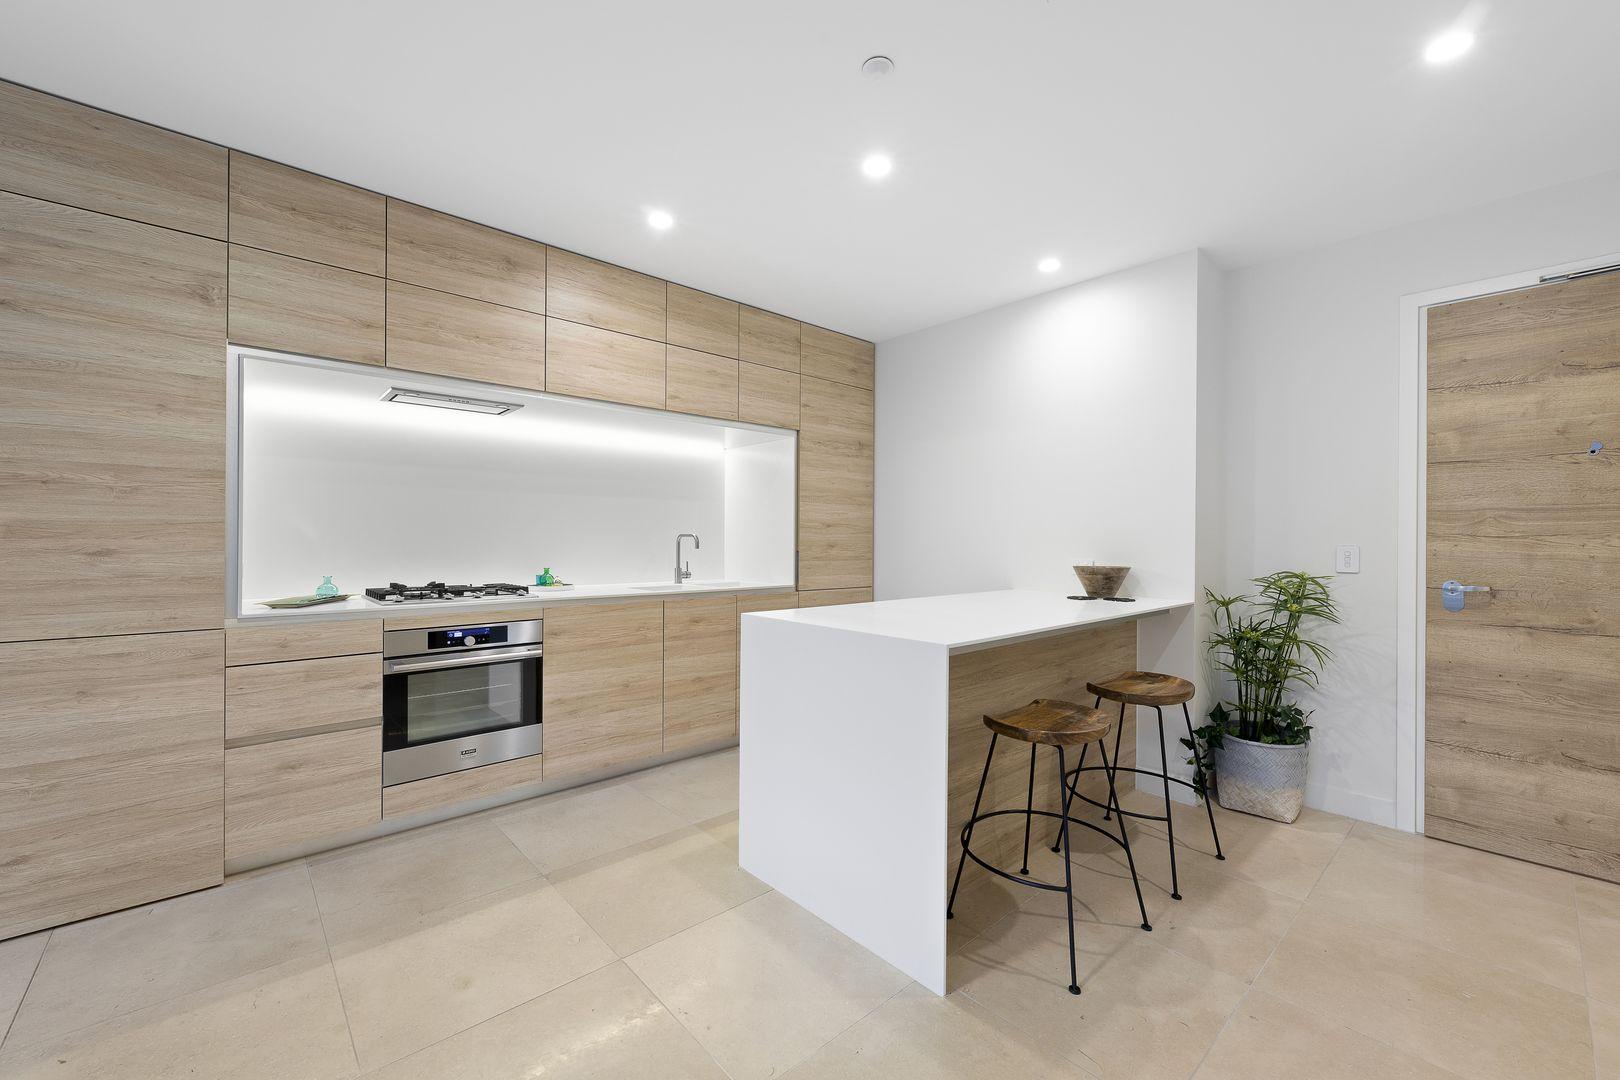 1608/12 Queens Road, Melbourne 3004 VIC 3004, Image 1